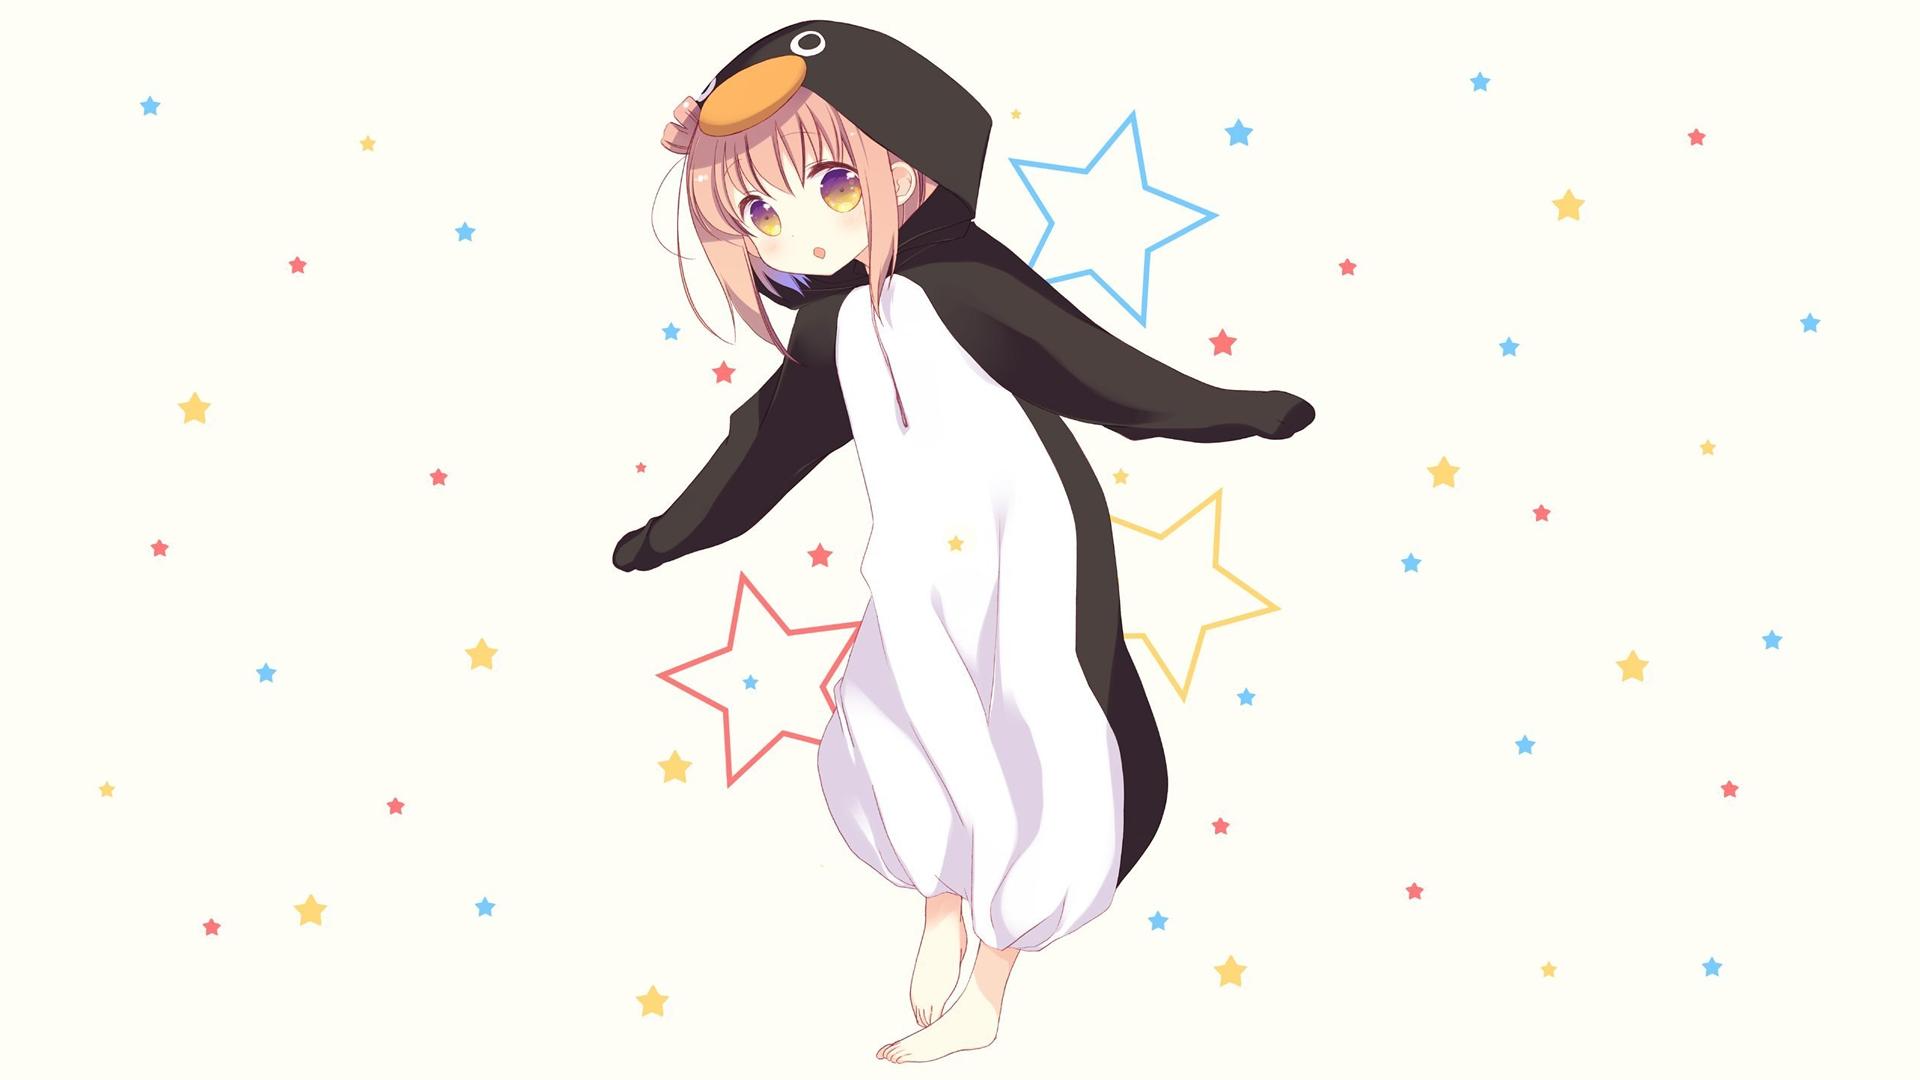 Sfondi Manga Anime Girls Sfondo Semplice Stelle Pinguini